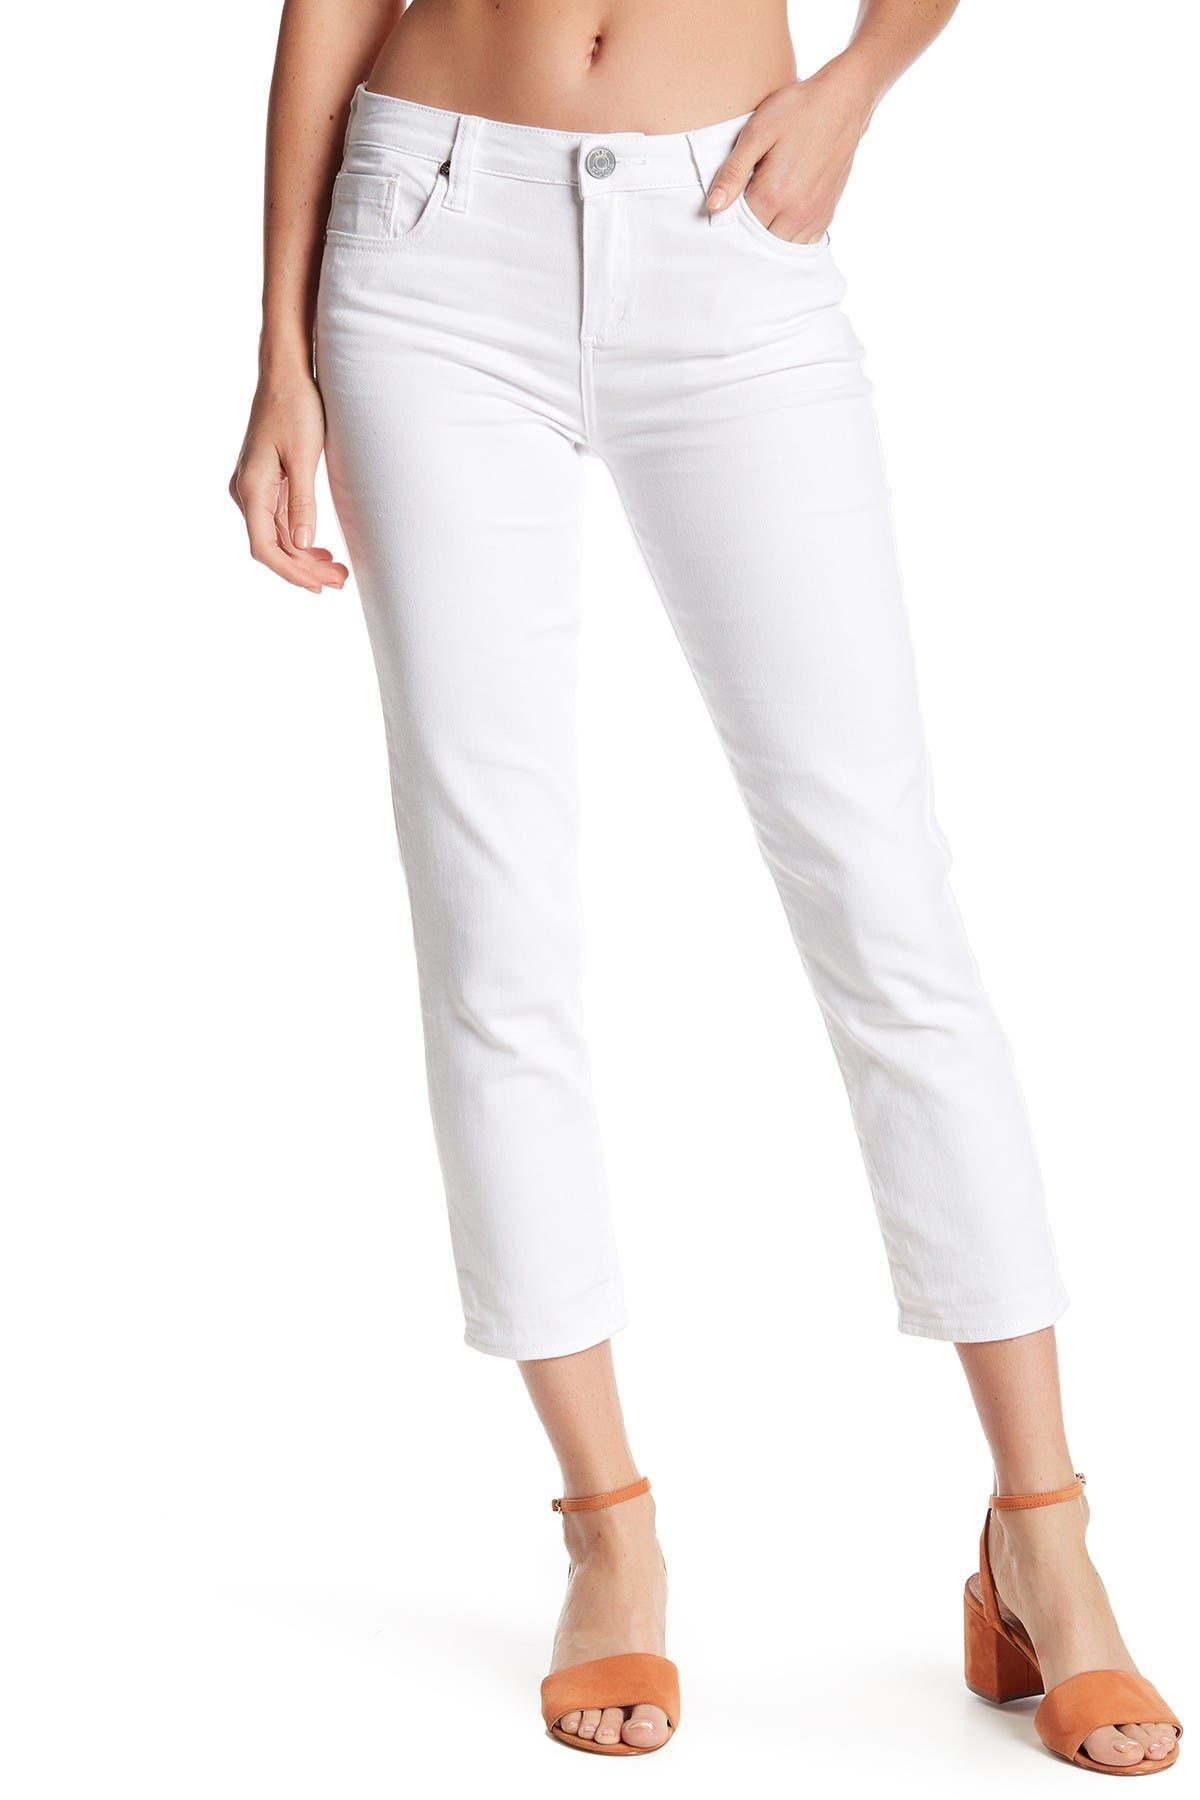 Image of KUT from the Kloth Bardot Skinny Boyfriend Jeans